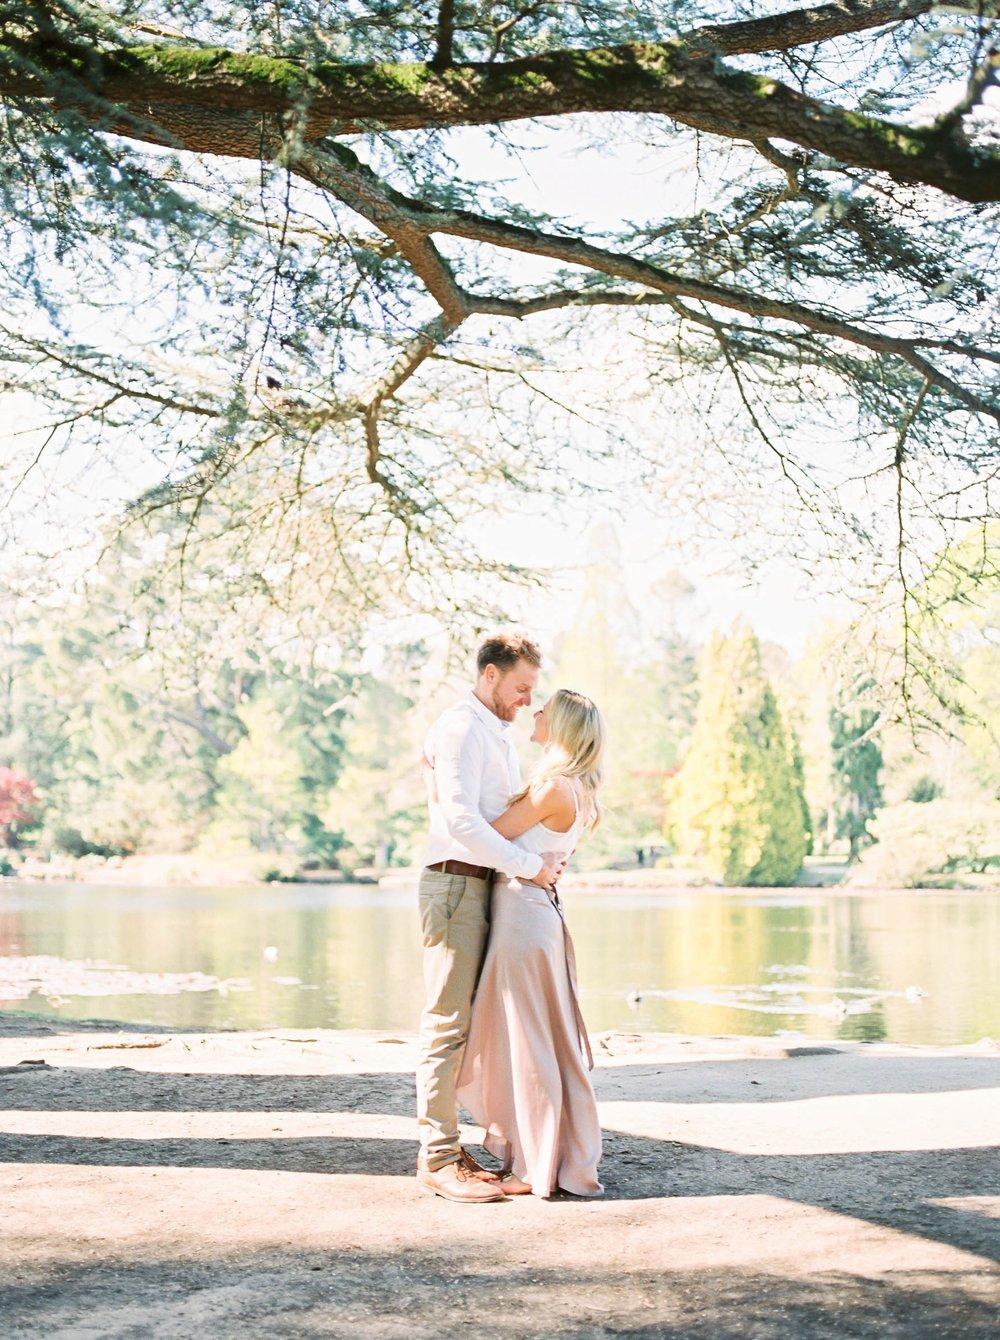 Amy O'Boyle Photography- Destination & UK Fine Art Film Wedding Photographer- Sheffield Park Garden National Trust Spring Engagement Shoot-22.jpg